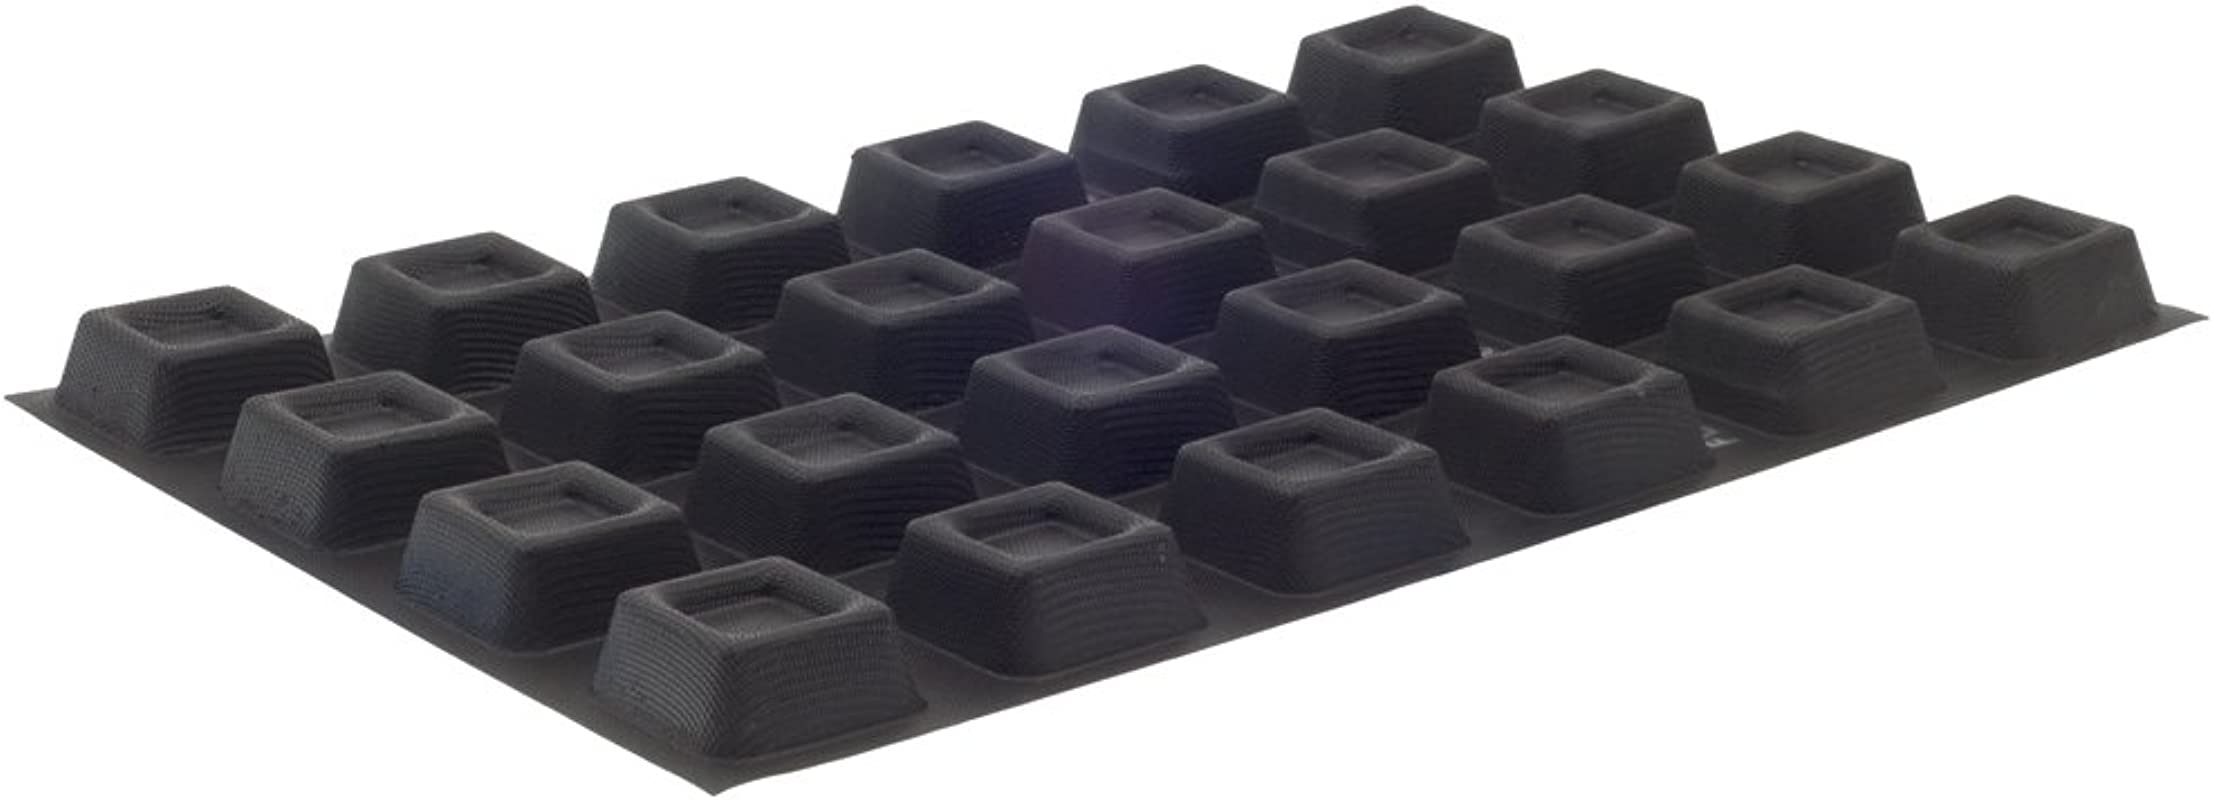 Demarle Flexipan Square Savarins 24 Forms